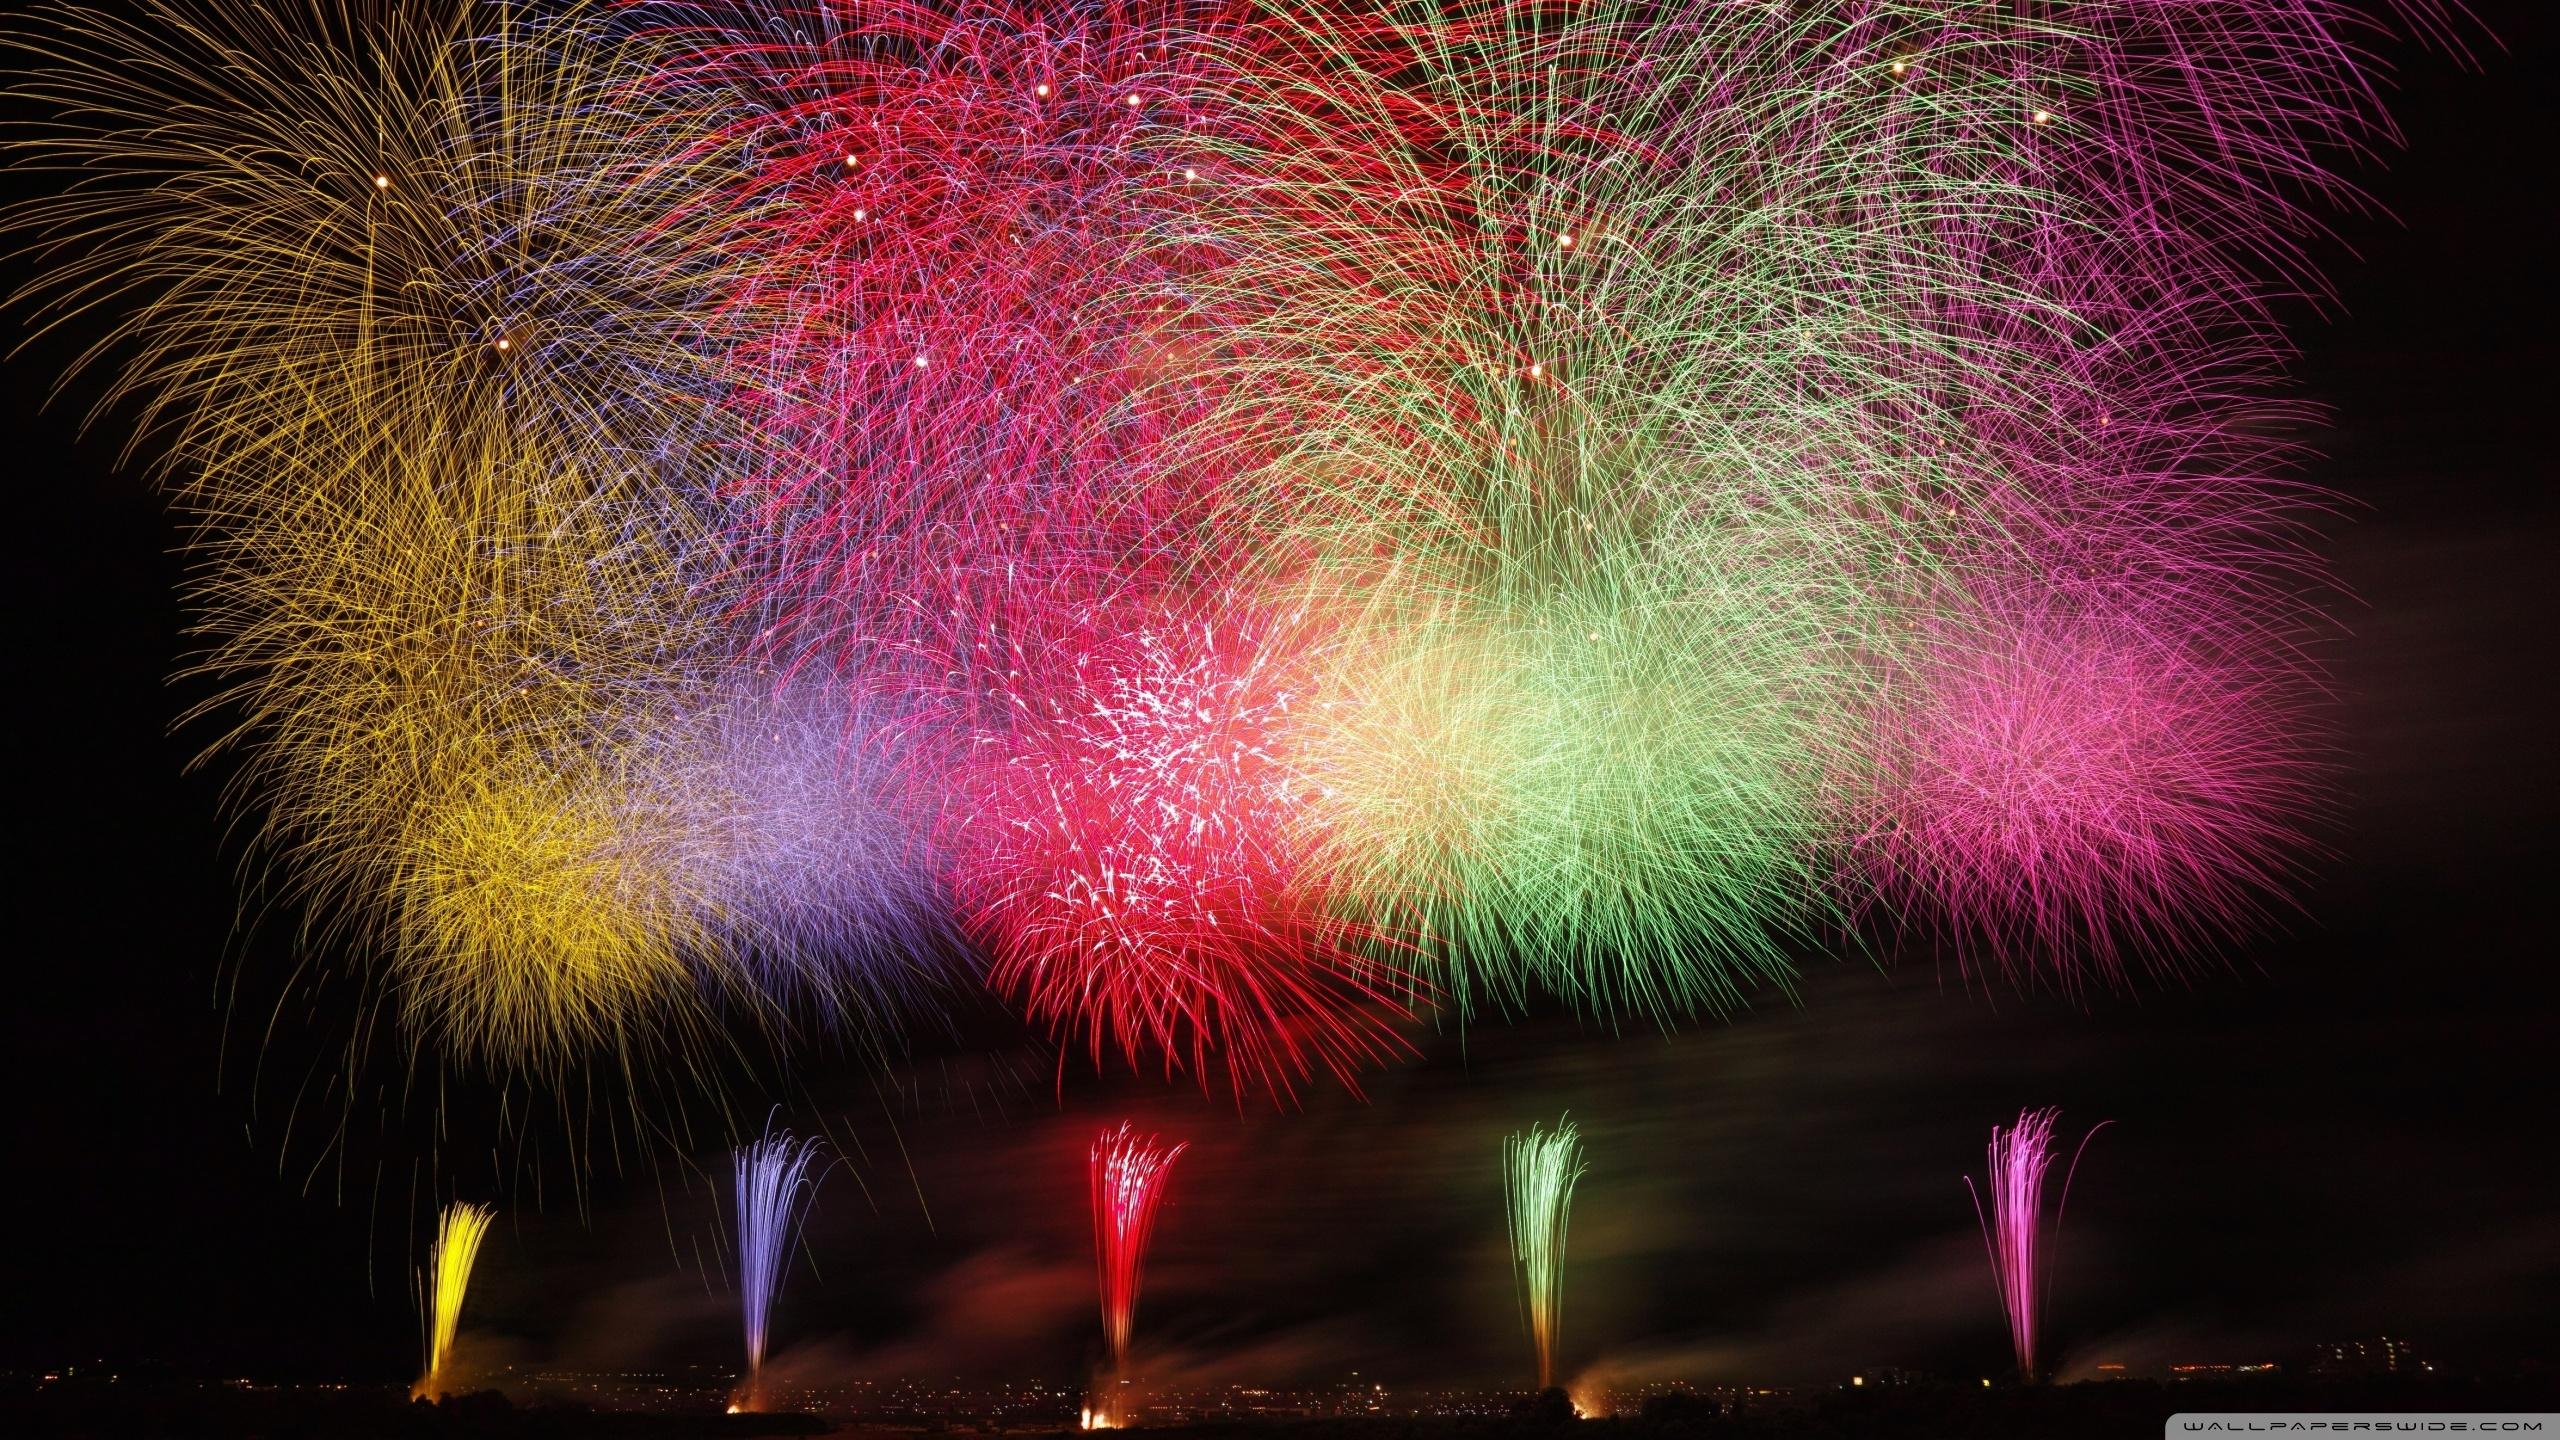 Amazing Fireworks 2020 Ultra HD Desktop Background Wallpaper for 2560x1440